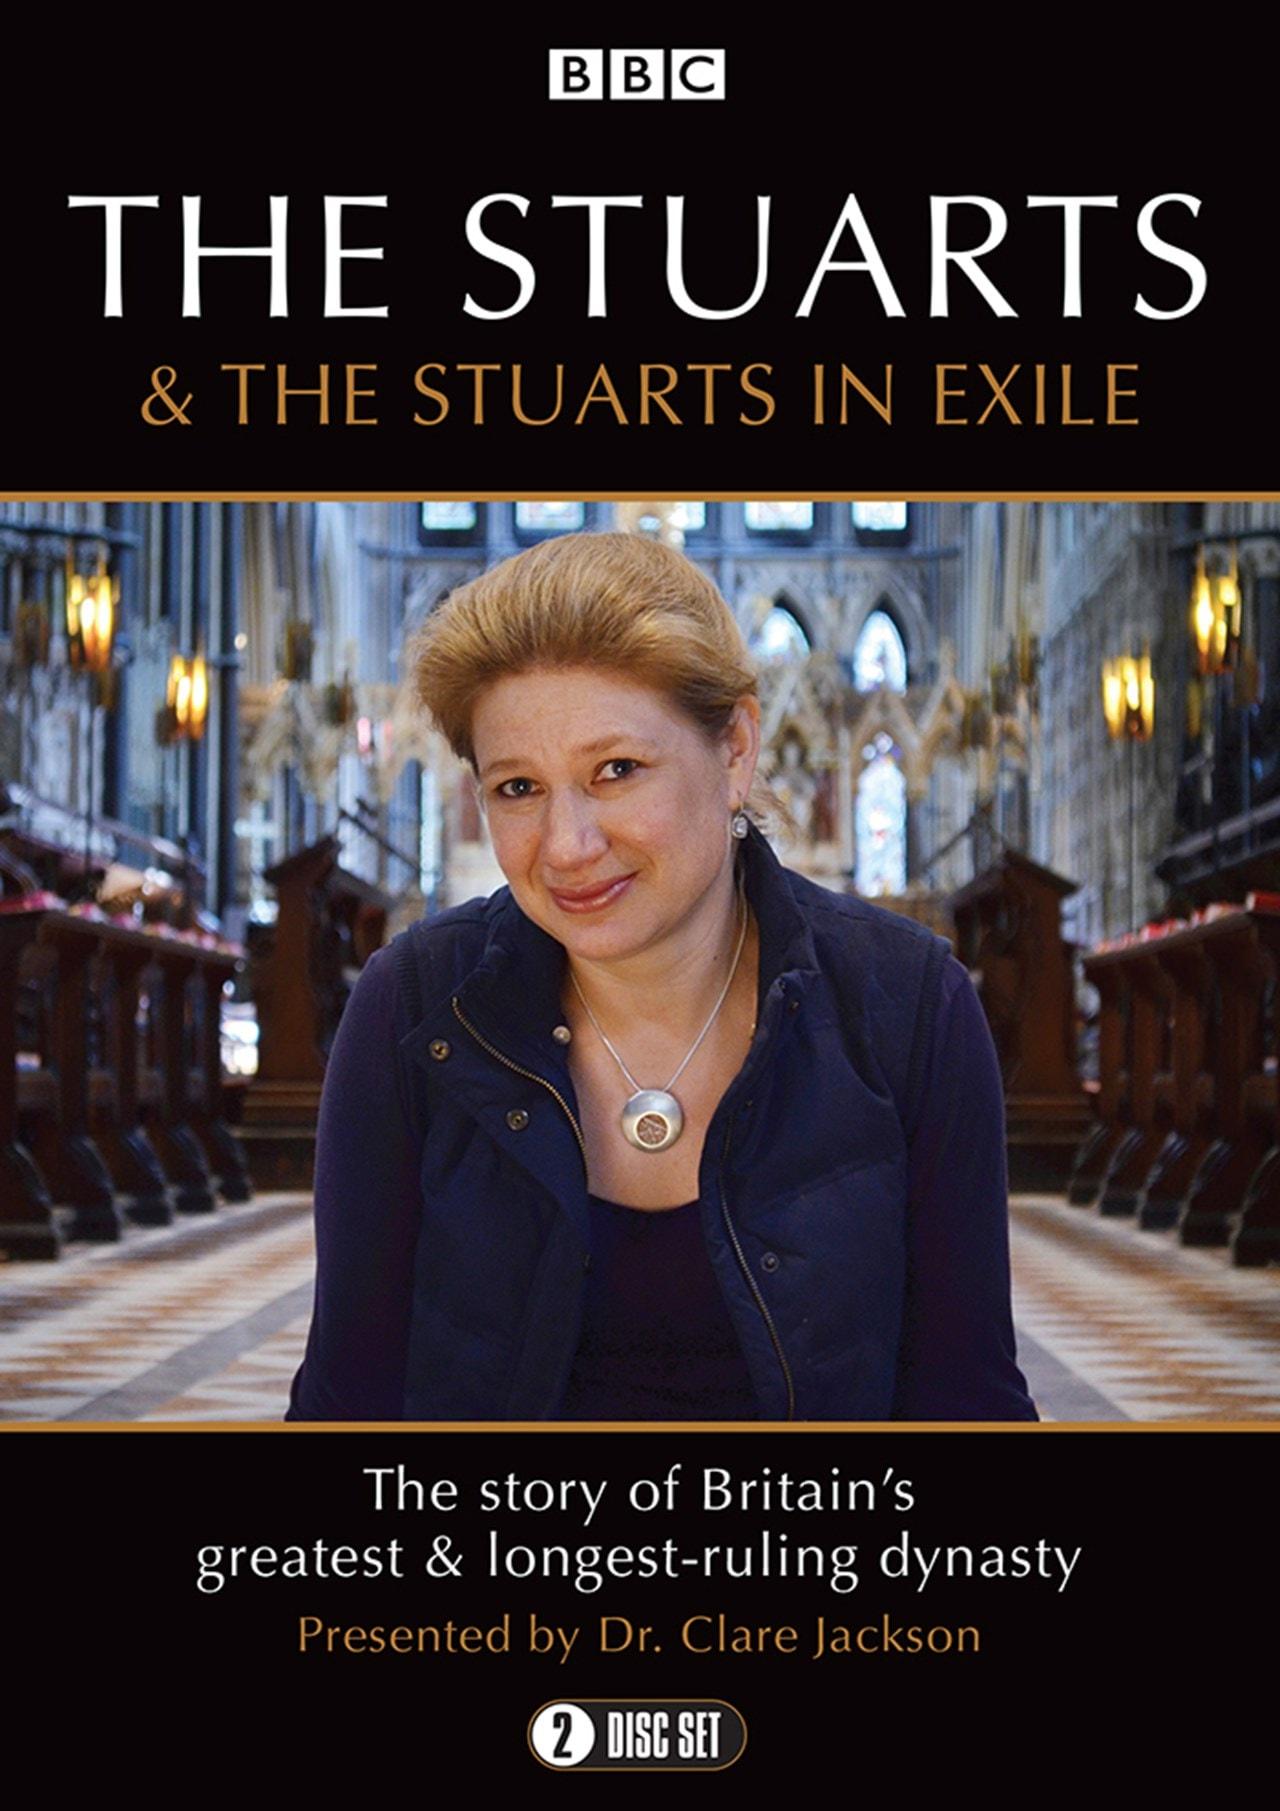 The Stuarts & the Stuarts in Exile - 1